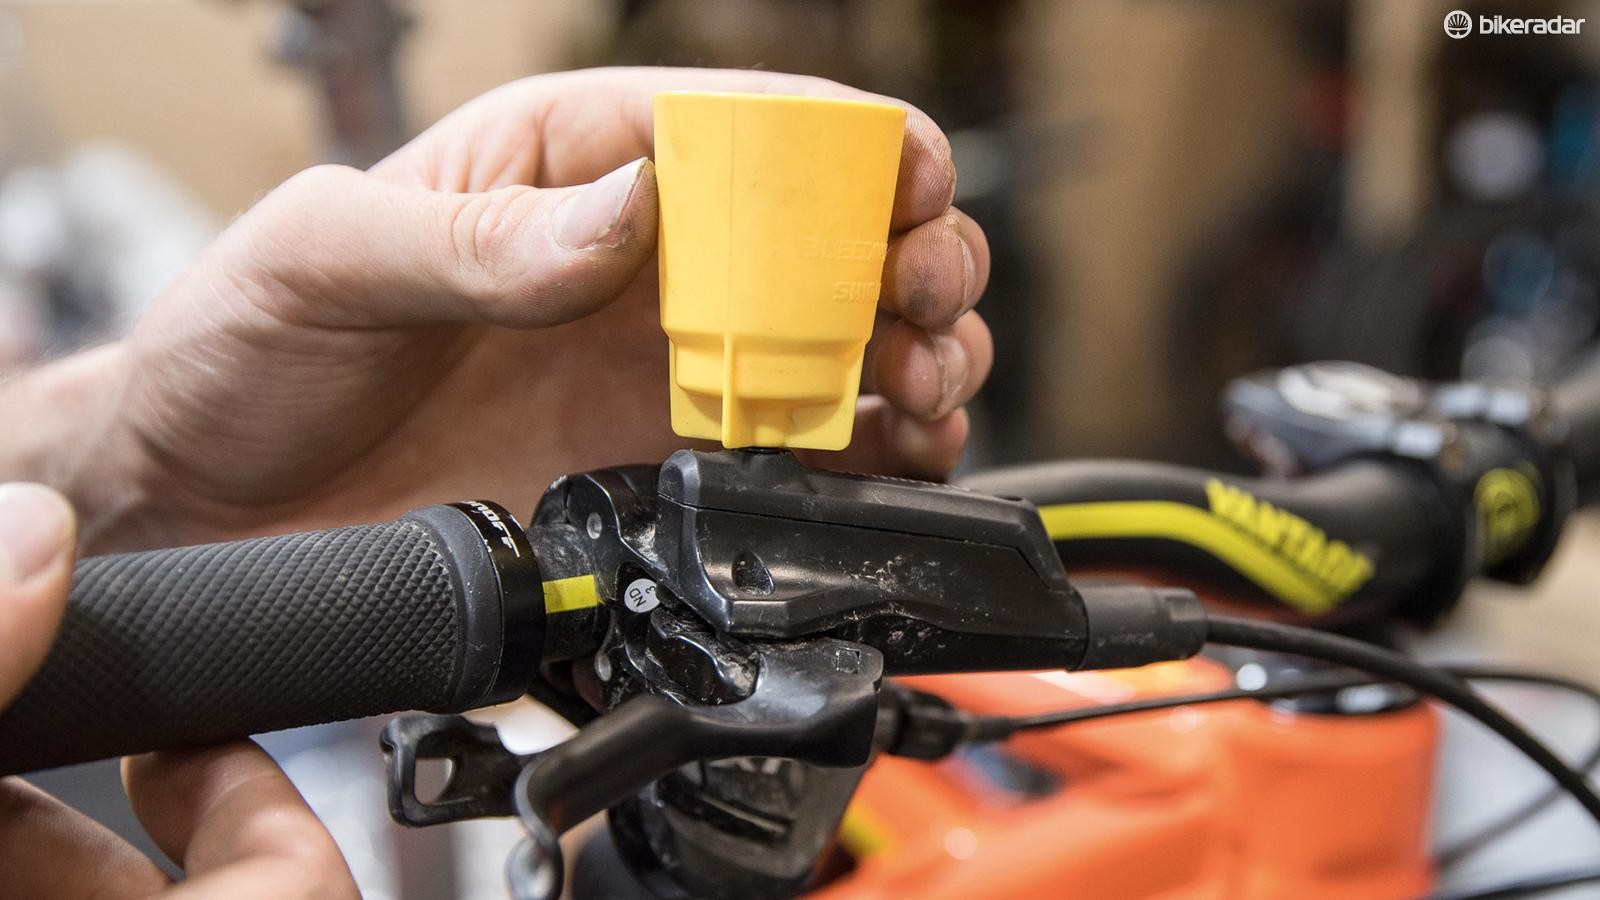 tips-for-bleeding-shimano-brake-02-1519948261051-190lbd28vyr07-1535015236448-1l4gumbsv9rfx-ad1dfee